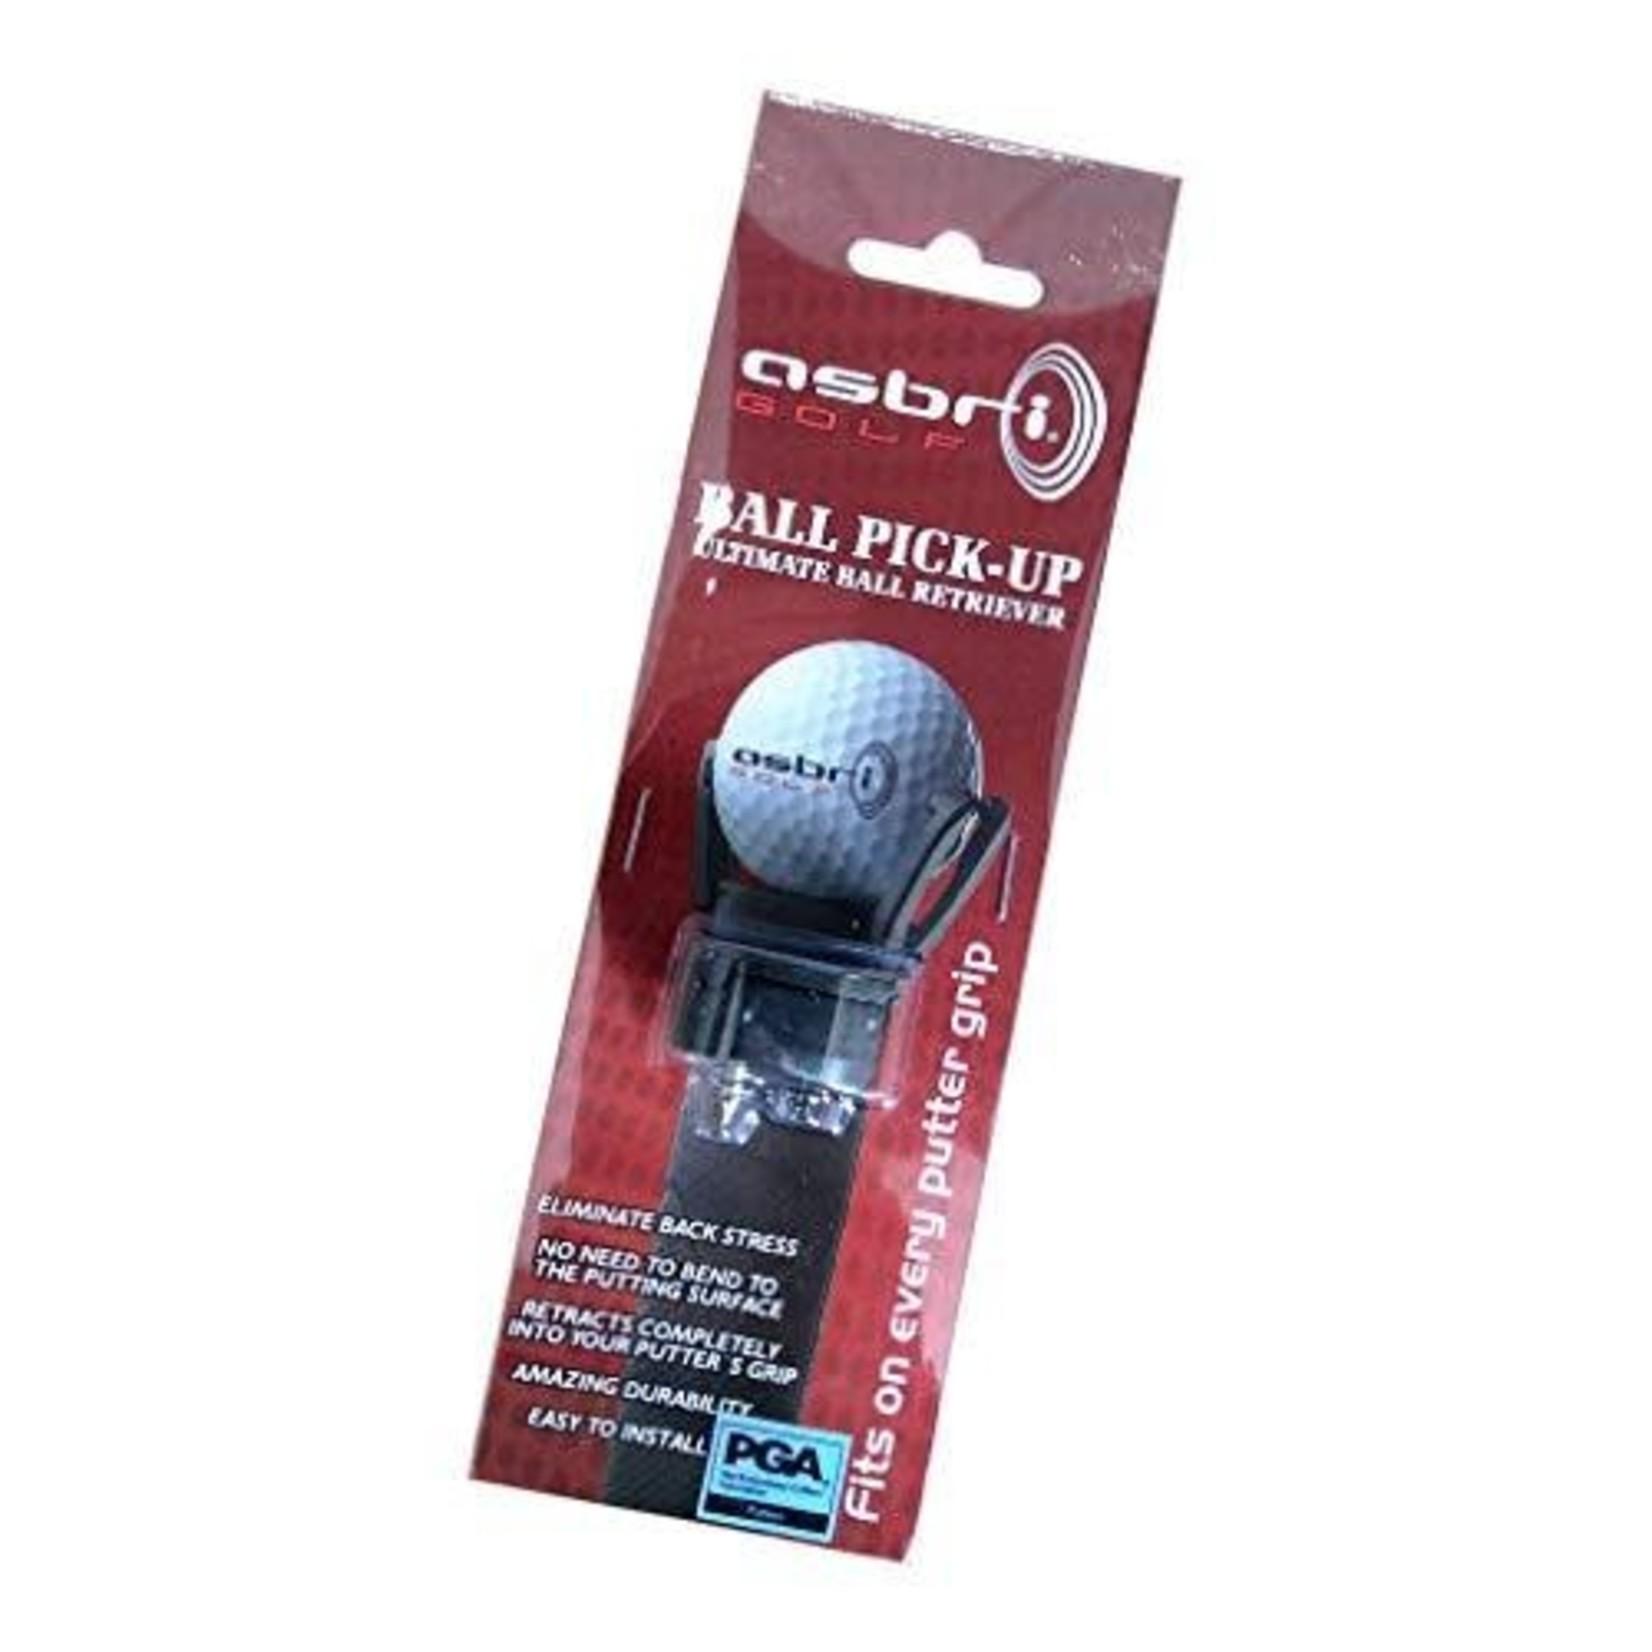 Asbri Asbri Ball Pickup With Metal Screw